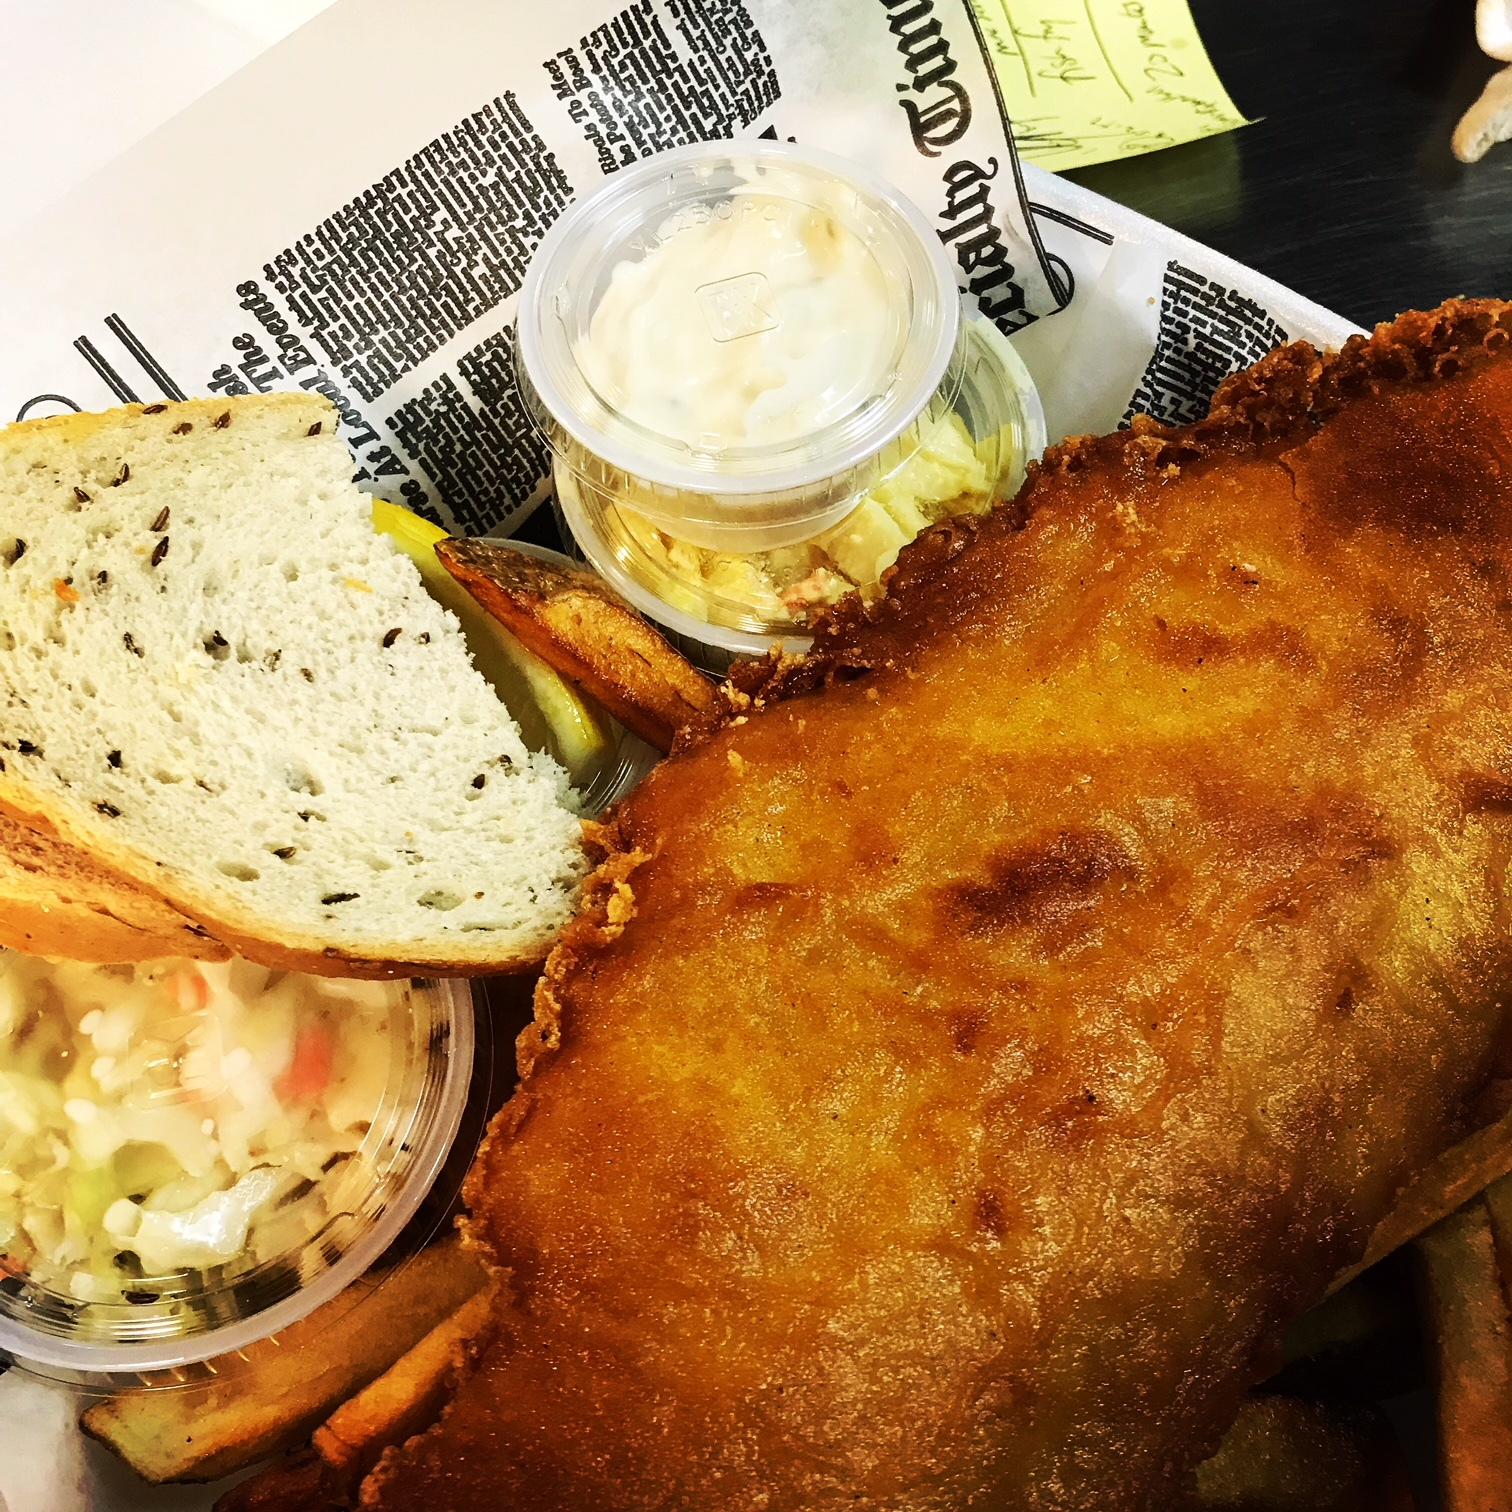 Beer Battered Haddock Fish Fry - $11.99